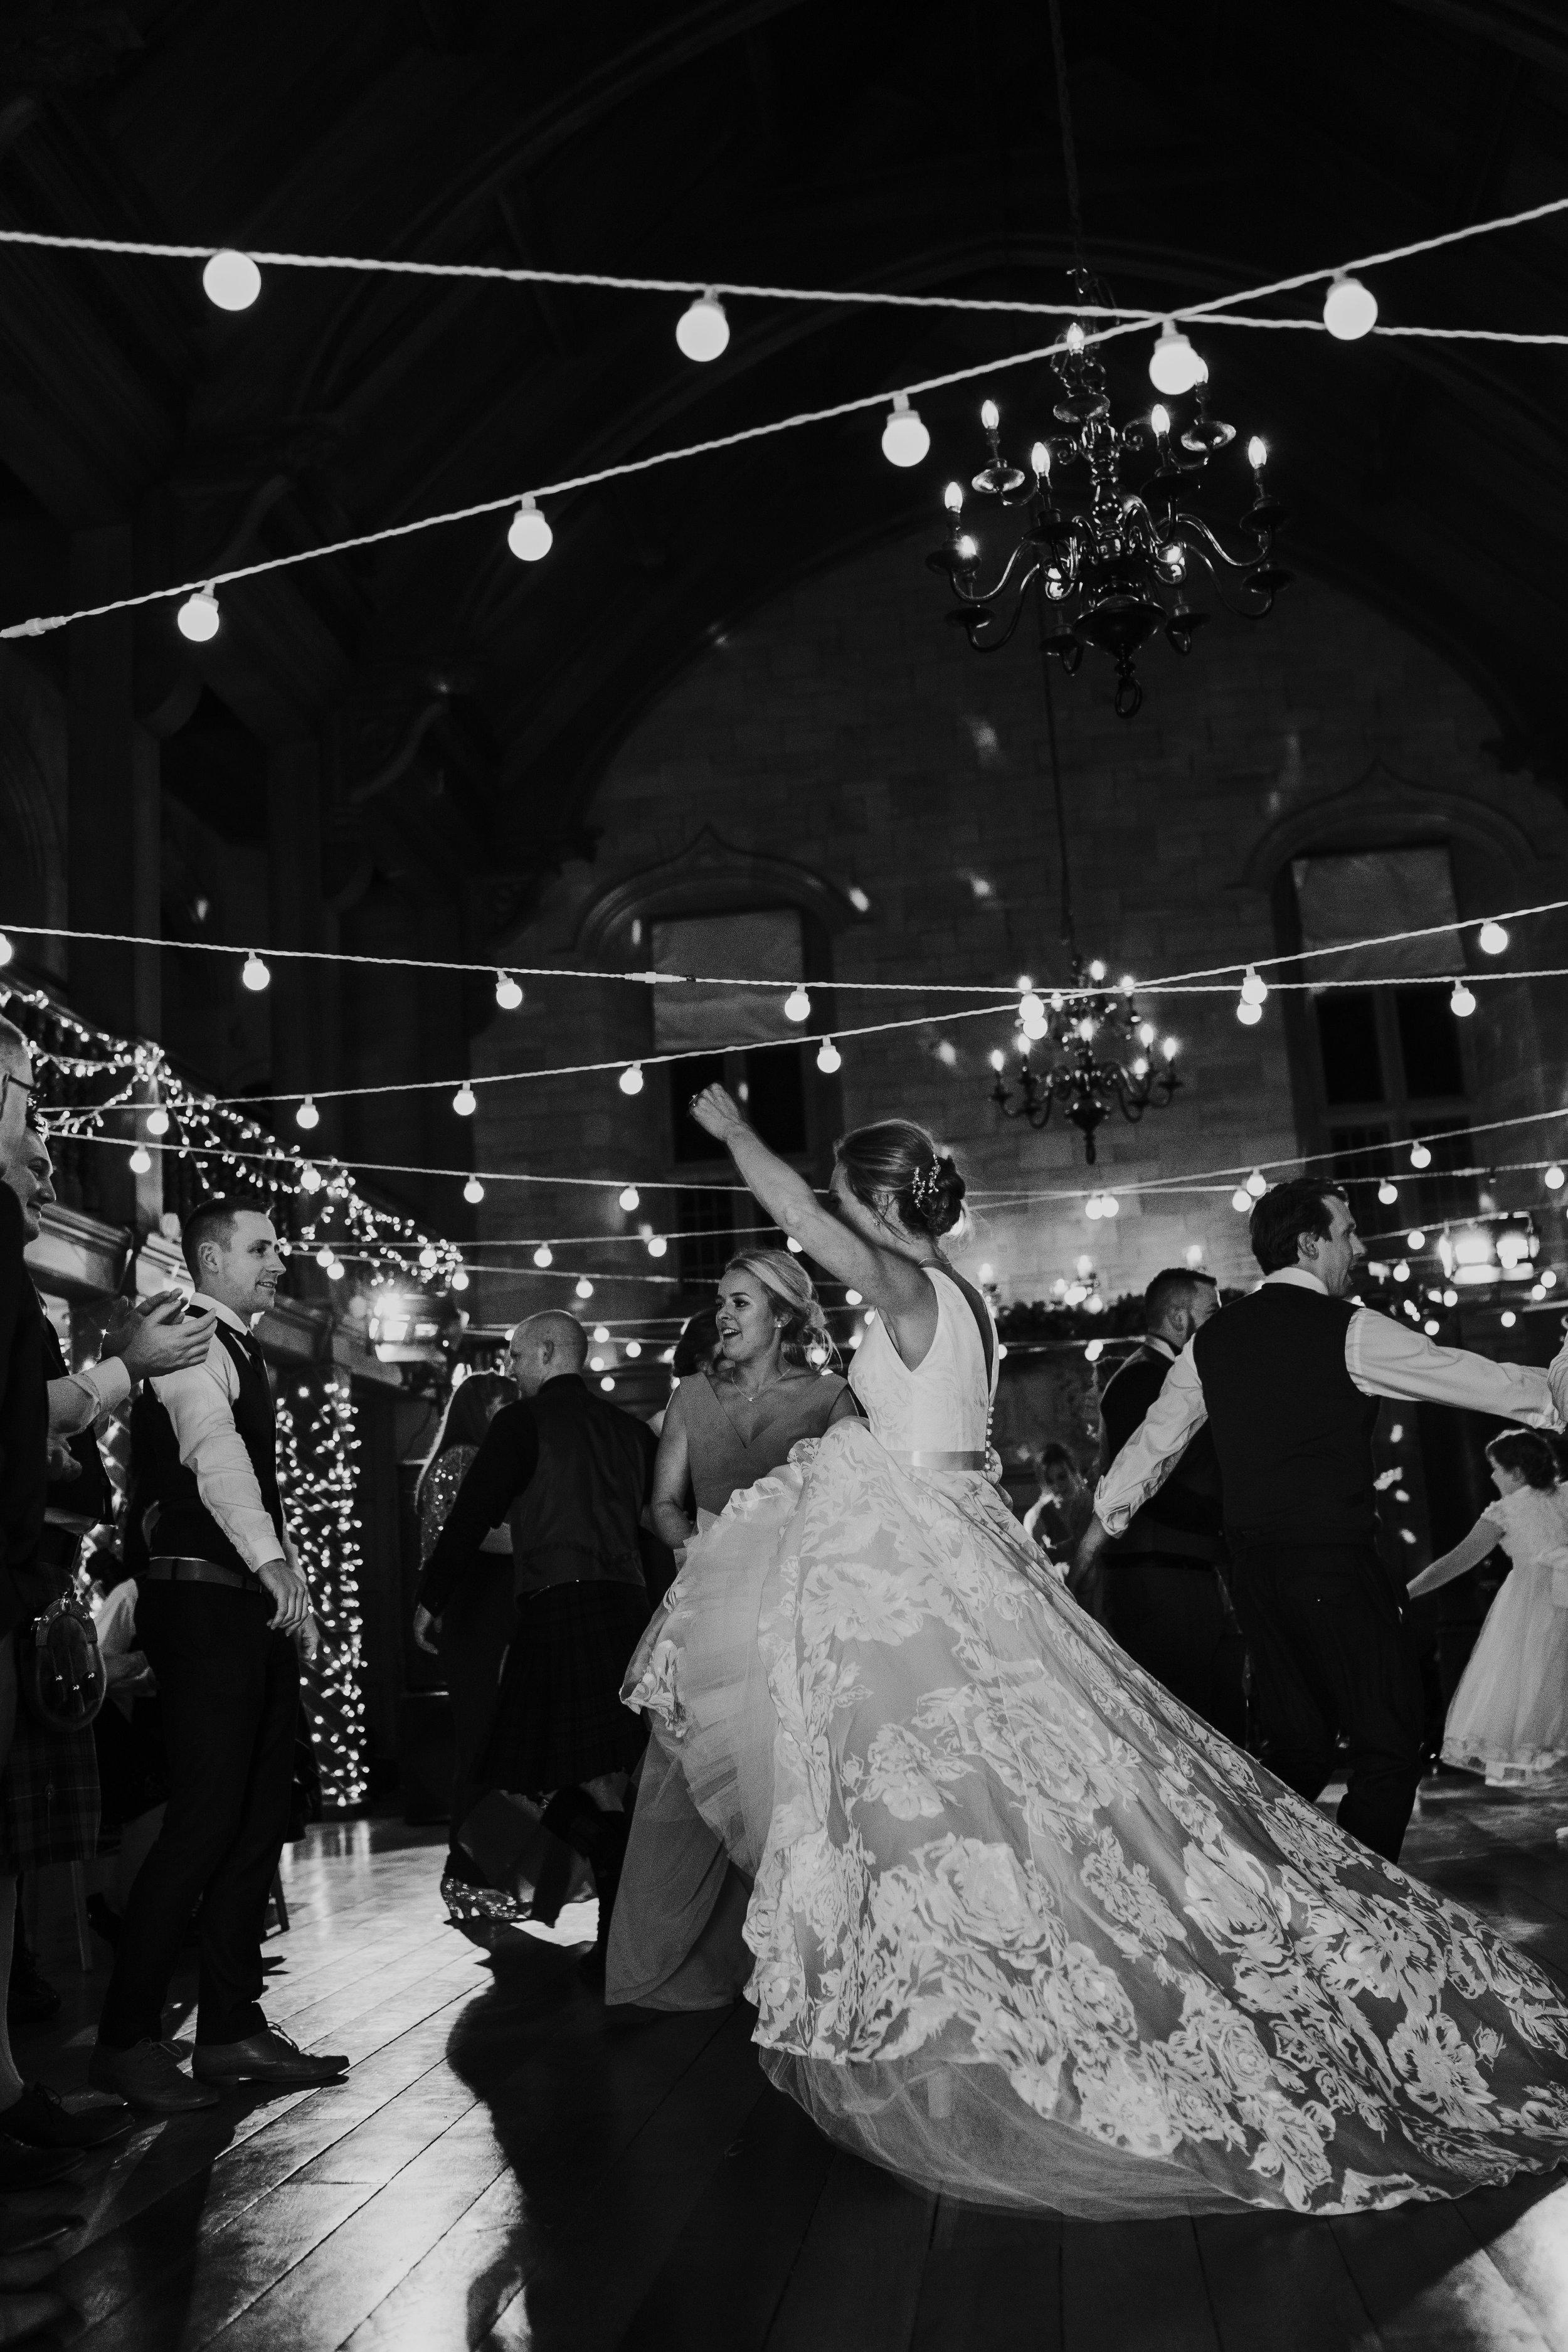 Karin_and_Shauns_Wedding_-_Achnagairn_Castle_-_www.eilidhrobertson.co.uk-1366.jpg